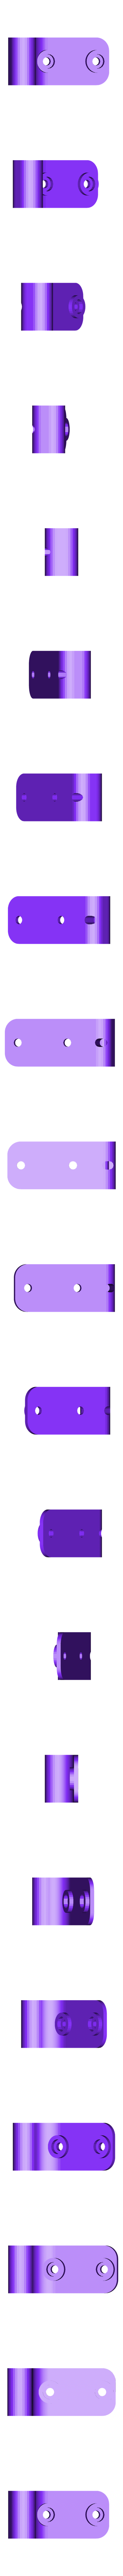 rigidbot_z_endstop_adjuster.stl Download free STL file RigidBot Z endstop level adjuster • 3D printable template, FrankLumien